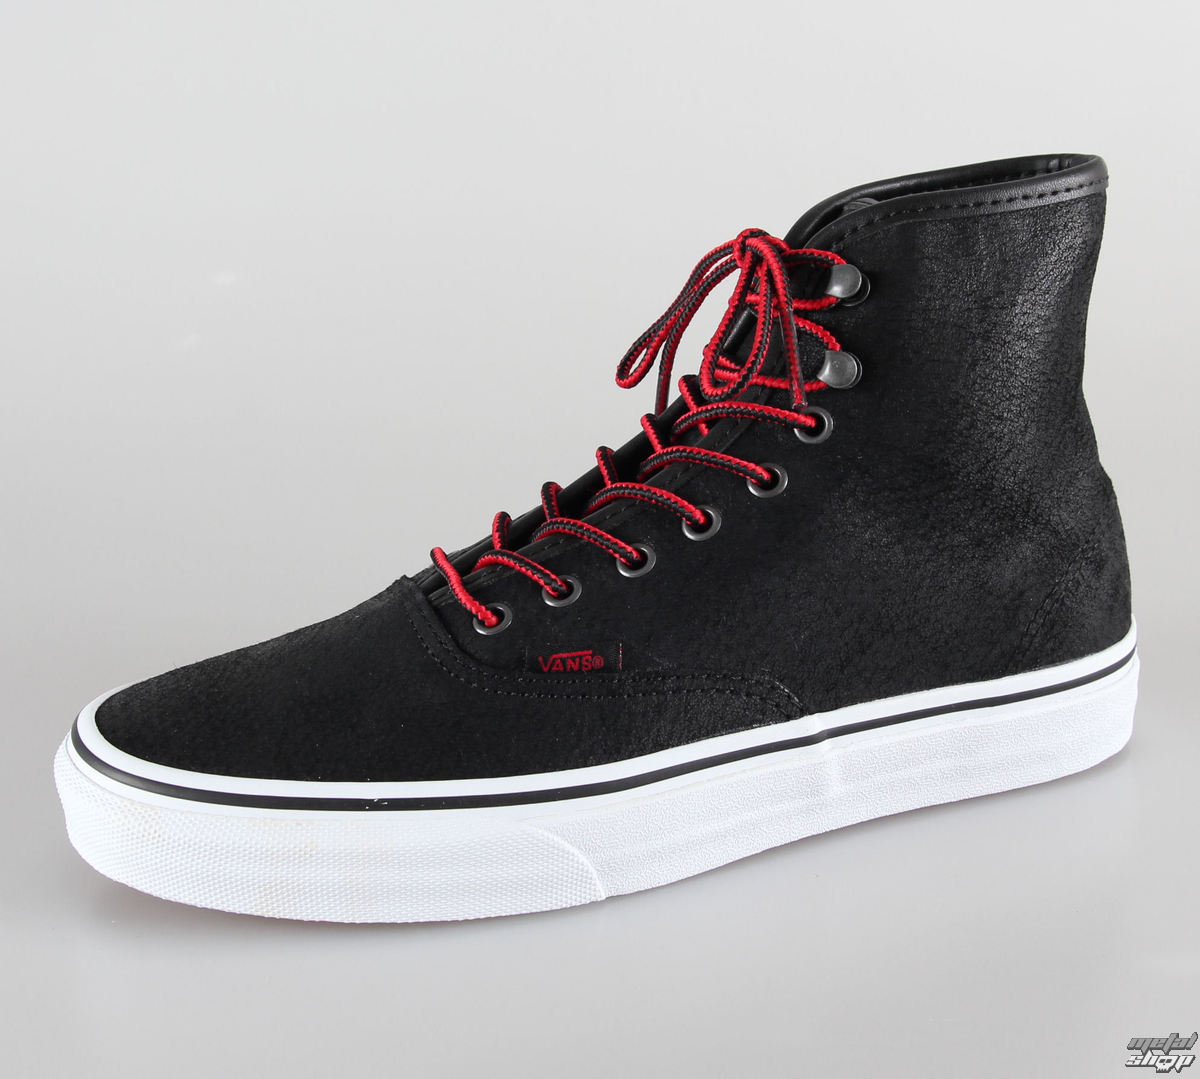 topánky dámske VANS - Authentic (Leather Hiker) - VRQF75F